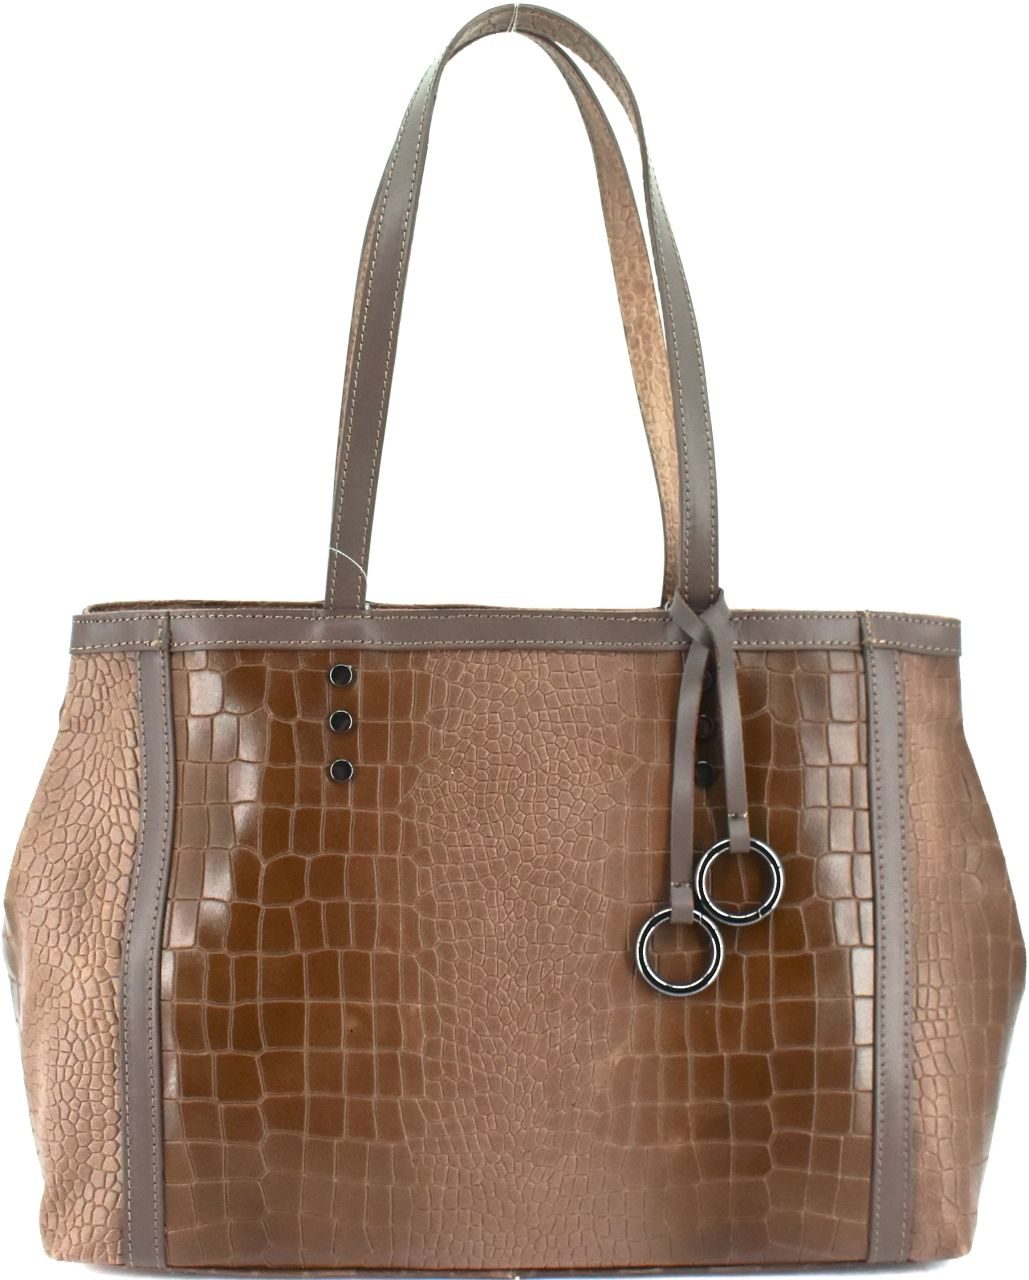 Dámská kožená kabelka Arteddy - taupe 31034